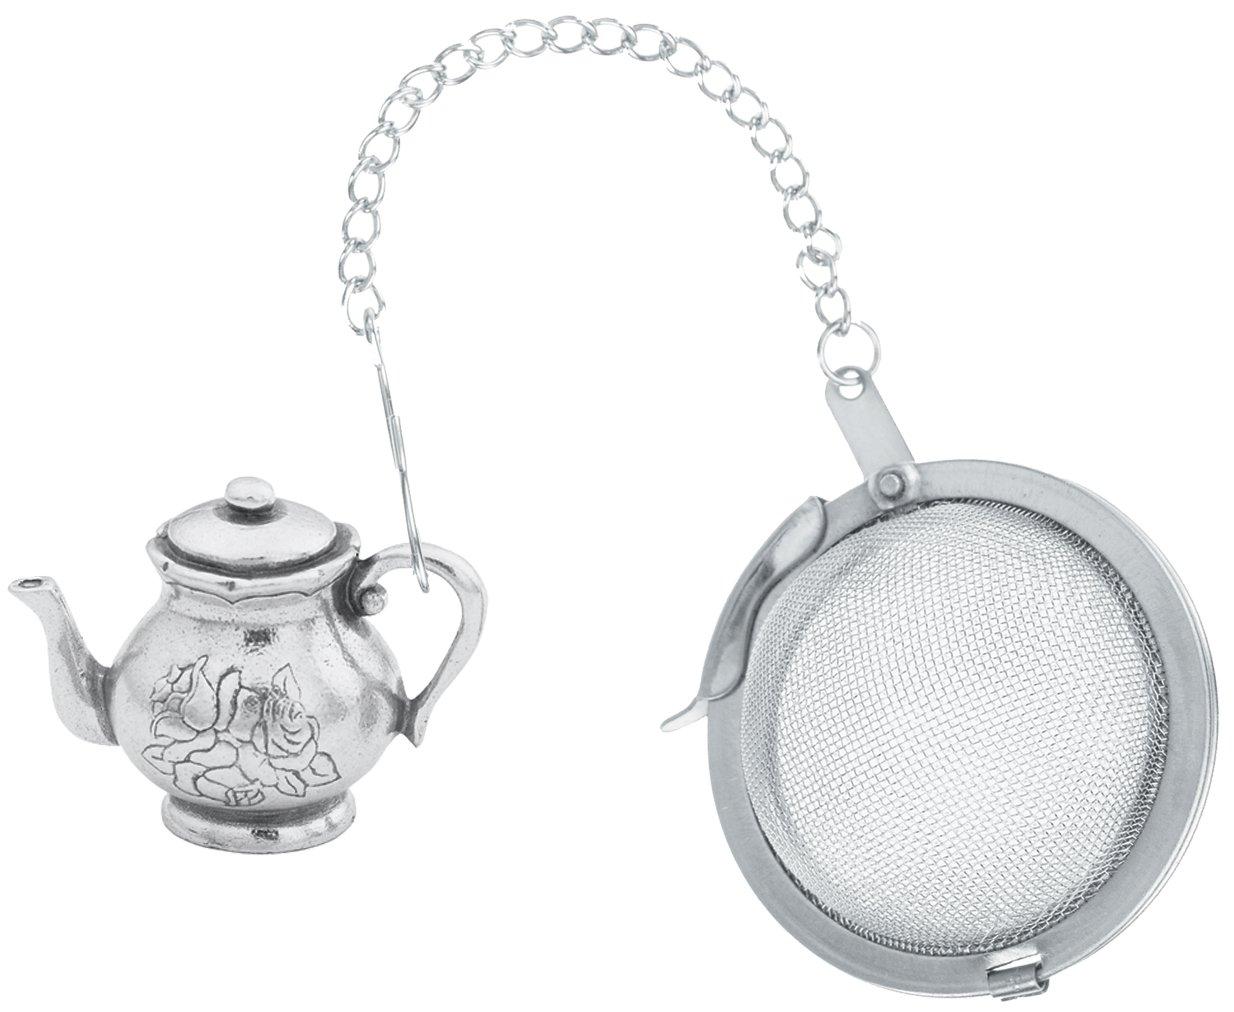 Danforth - English Teapot Pewter Tea Infuser by DANFORTH